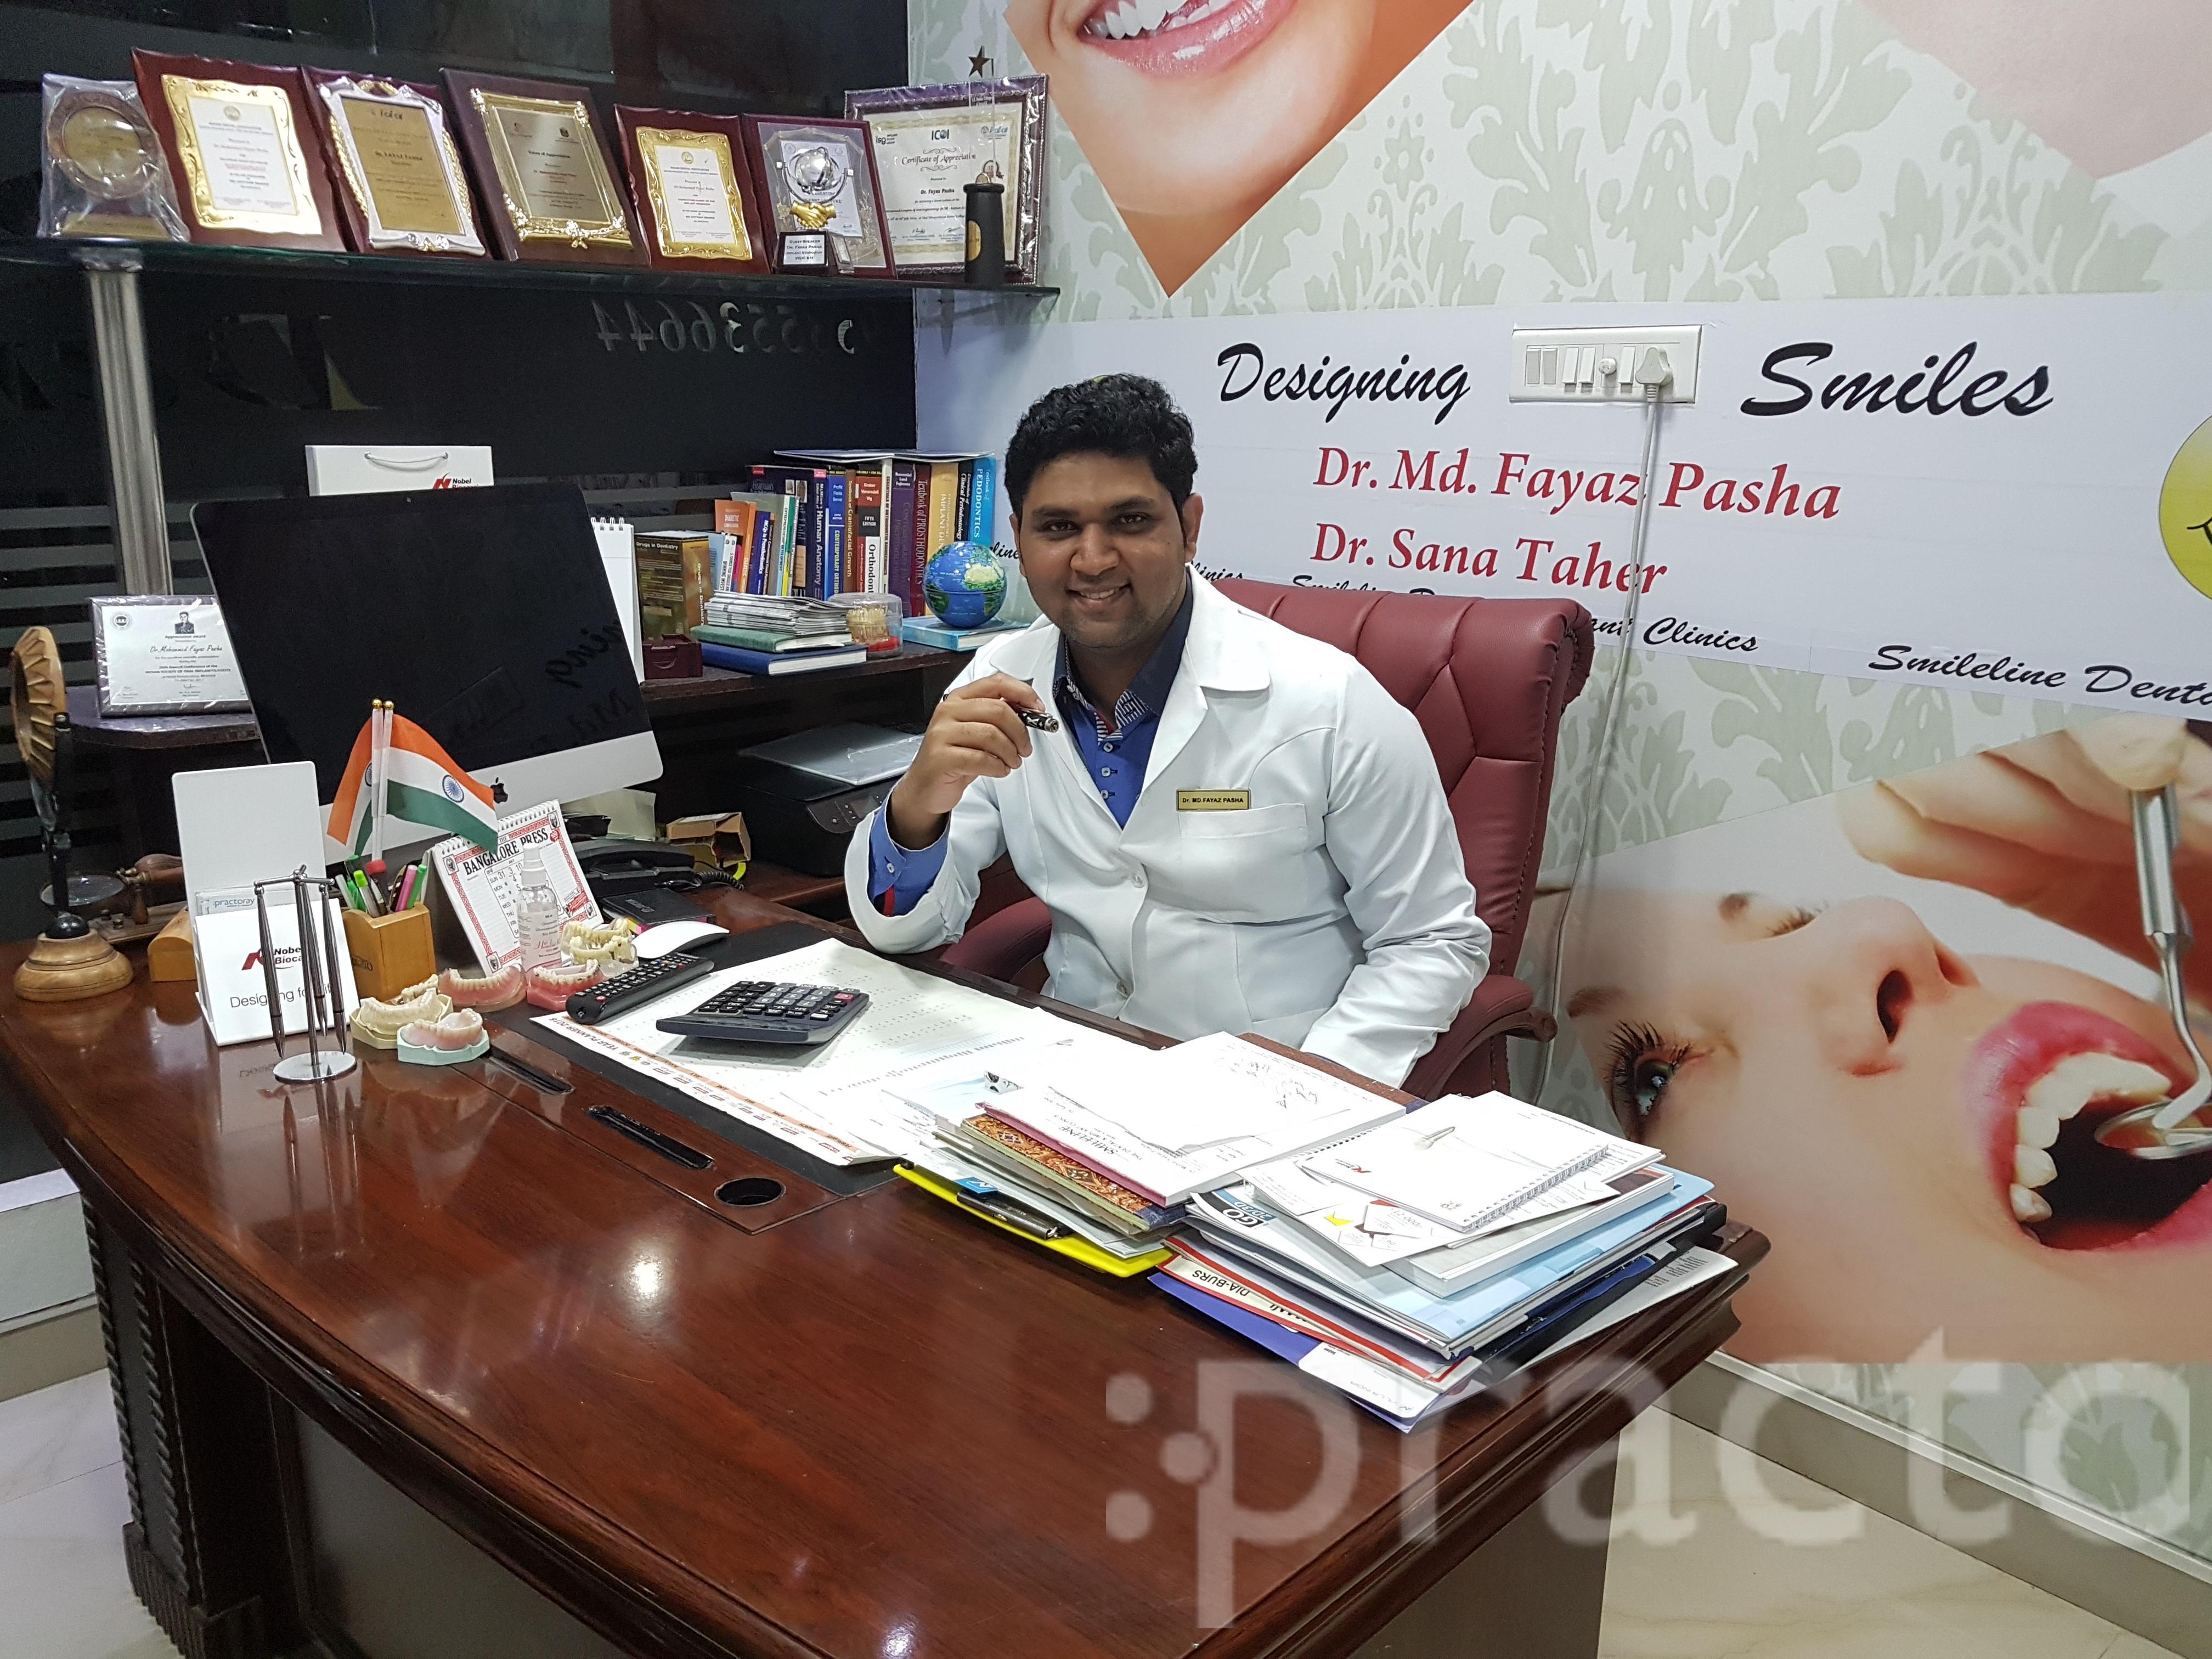 Dr. Fayaz Pasha - Dentist